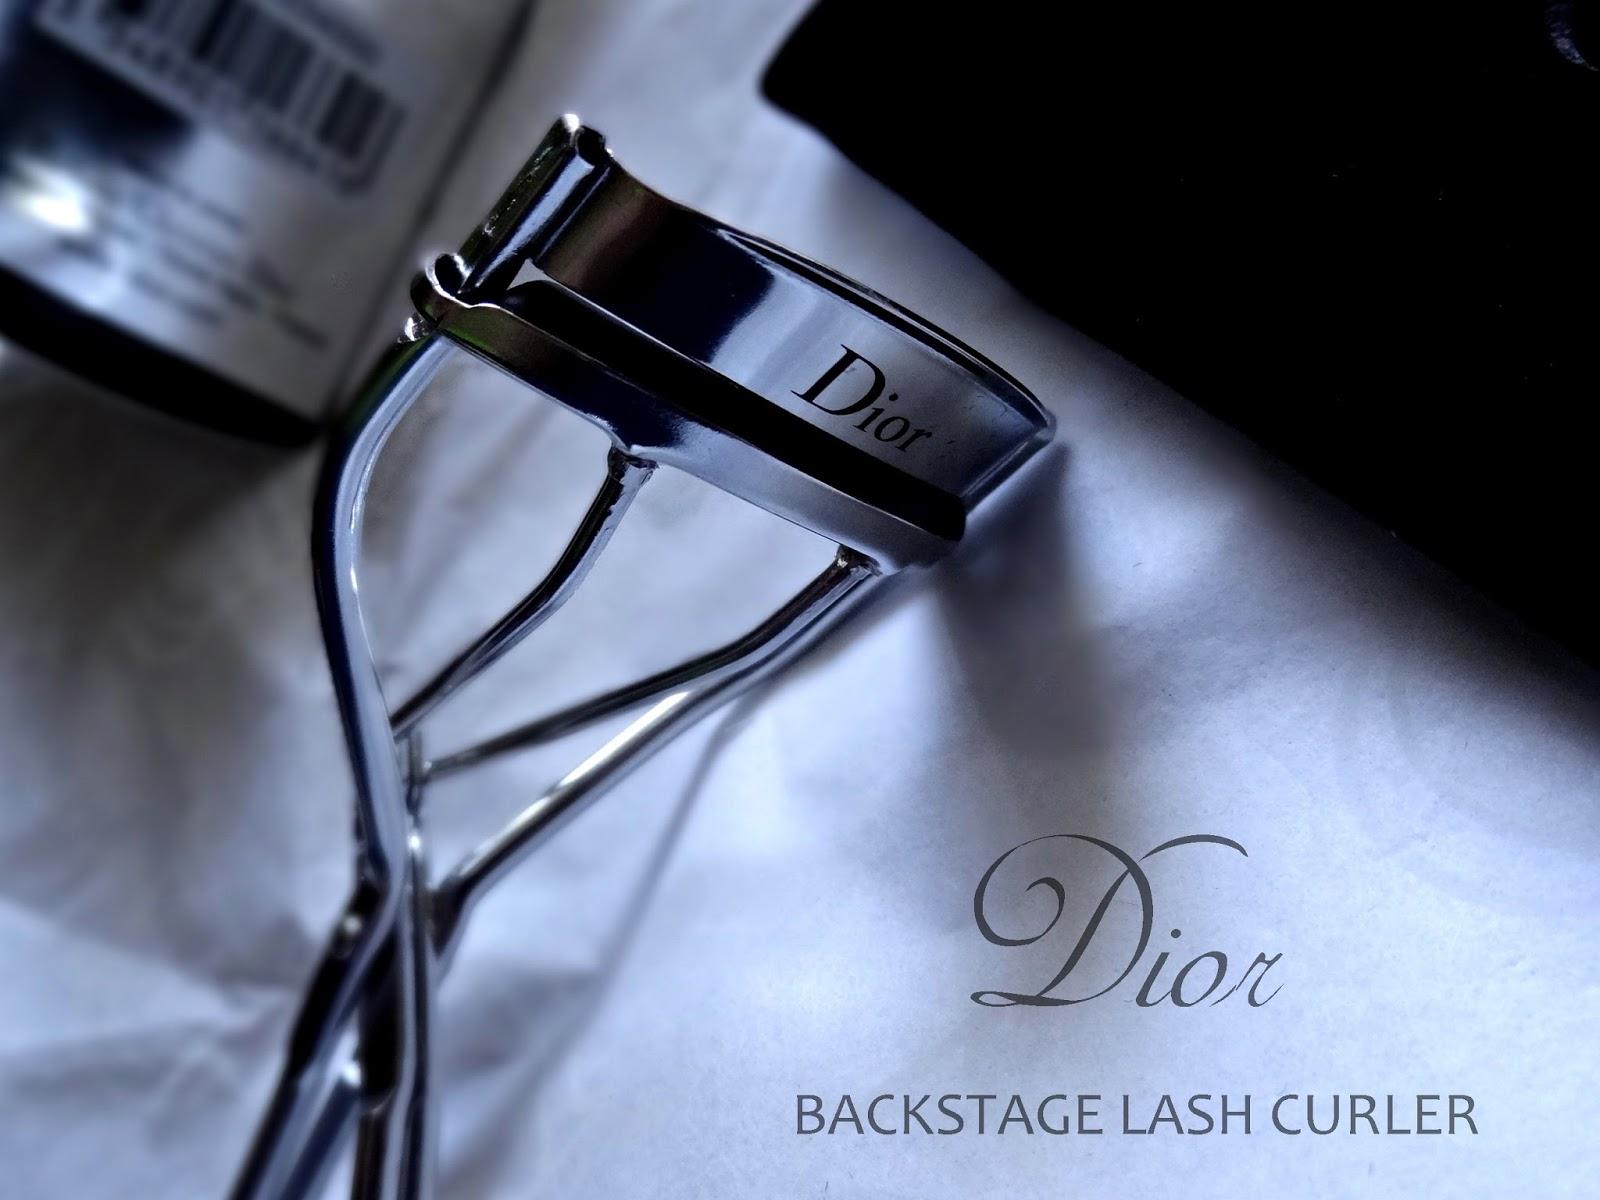 Dior Backstage Lash Curler